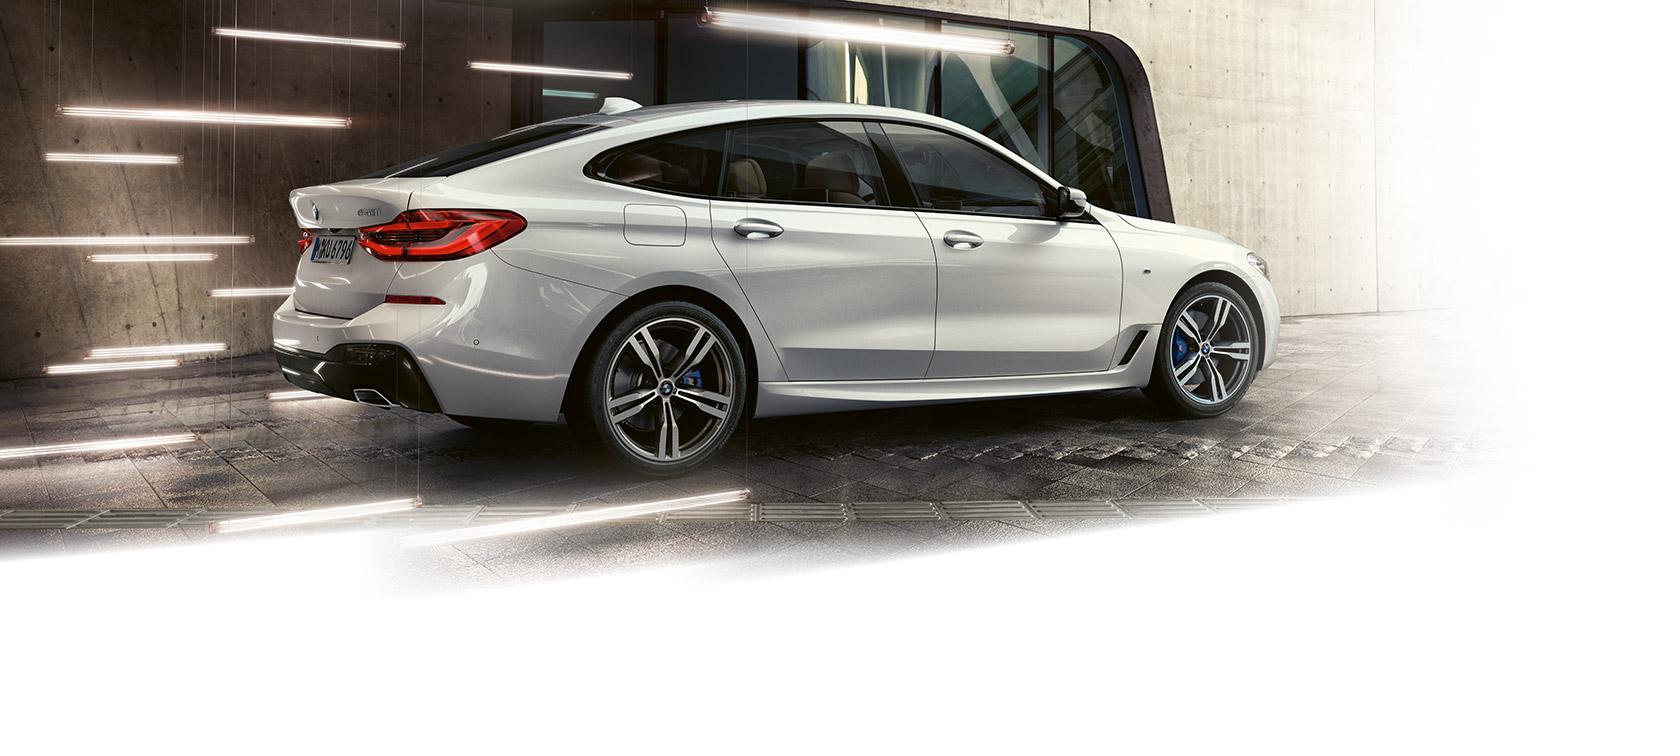 Bmw Gt Full Form >> Bmw 6 Series Gran Turismo At A Glance